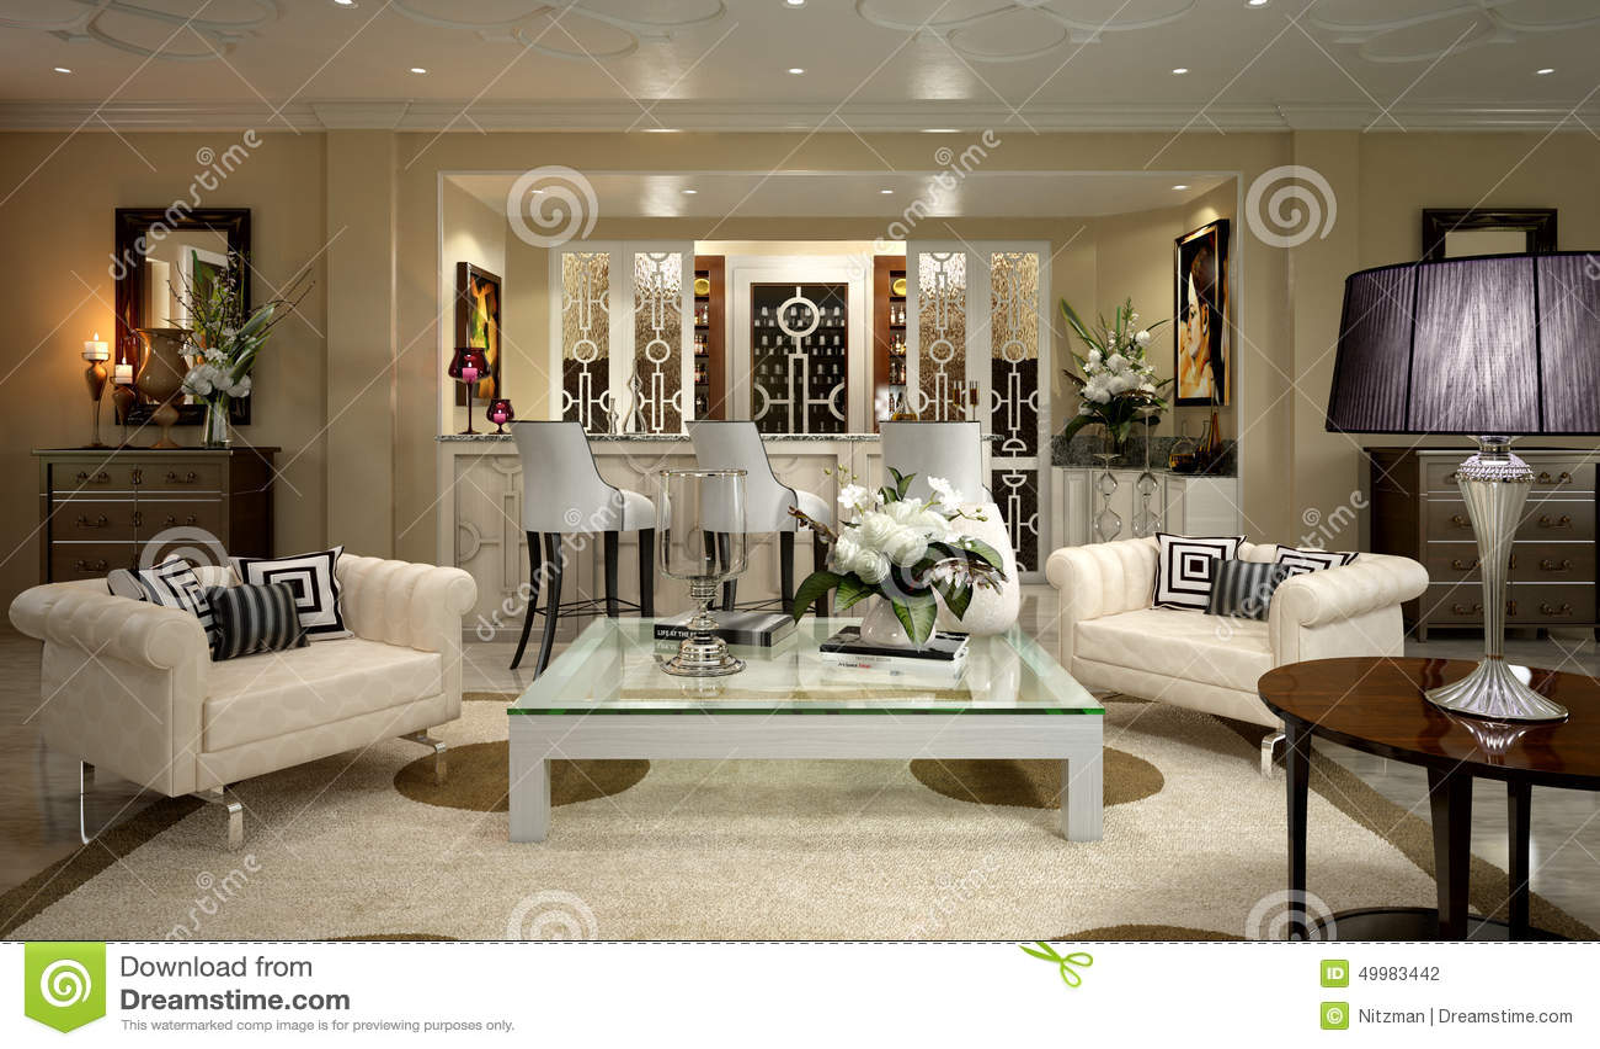 Appartement d 39 art d co illustration stock image 49983442 for Comdeco interieur appartement